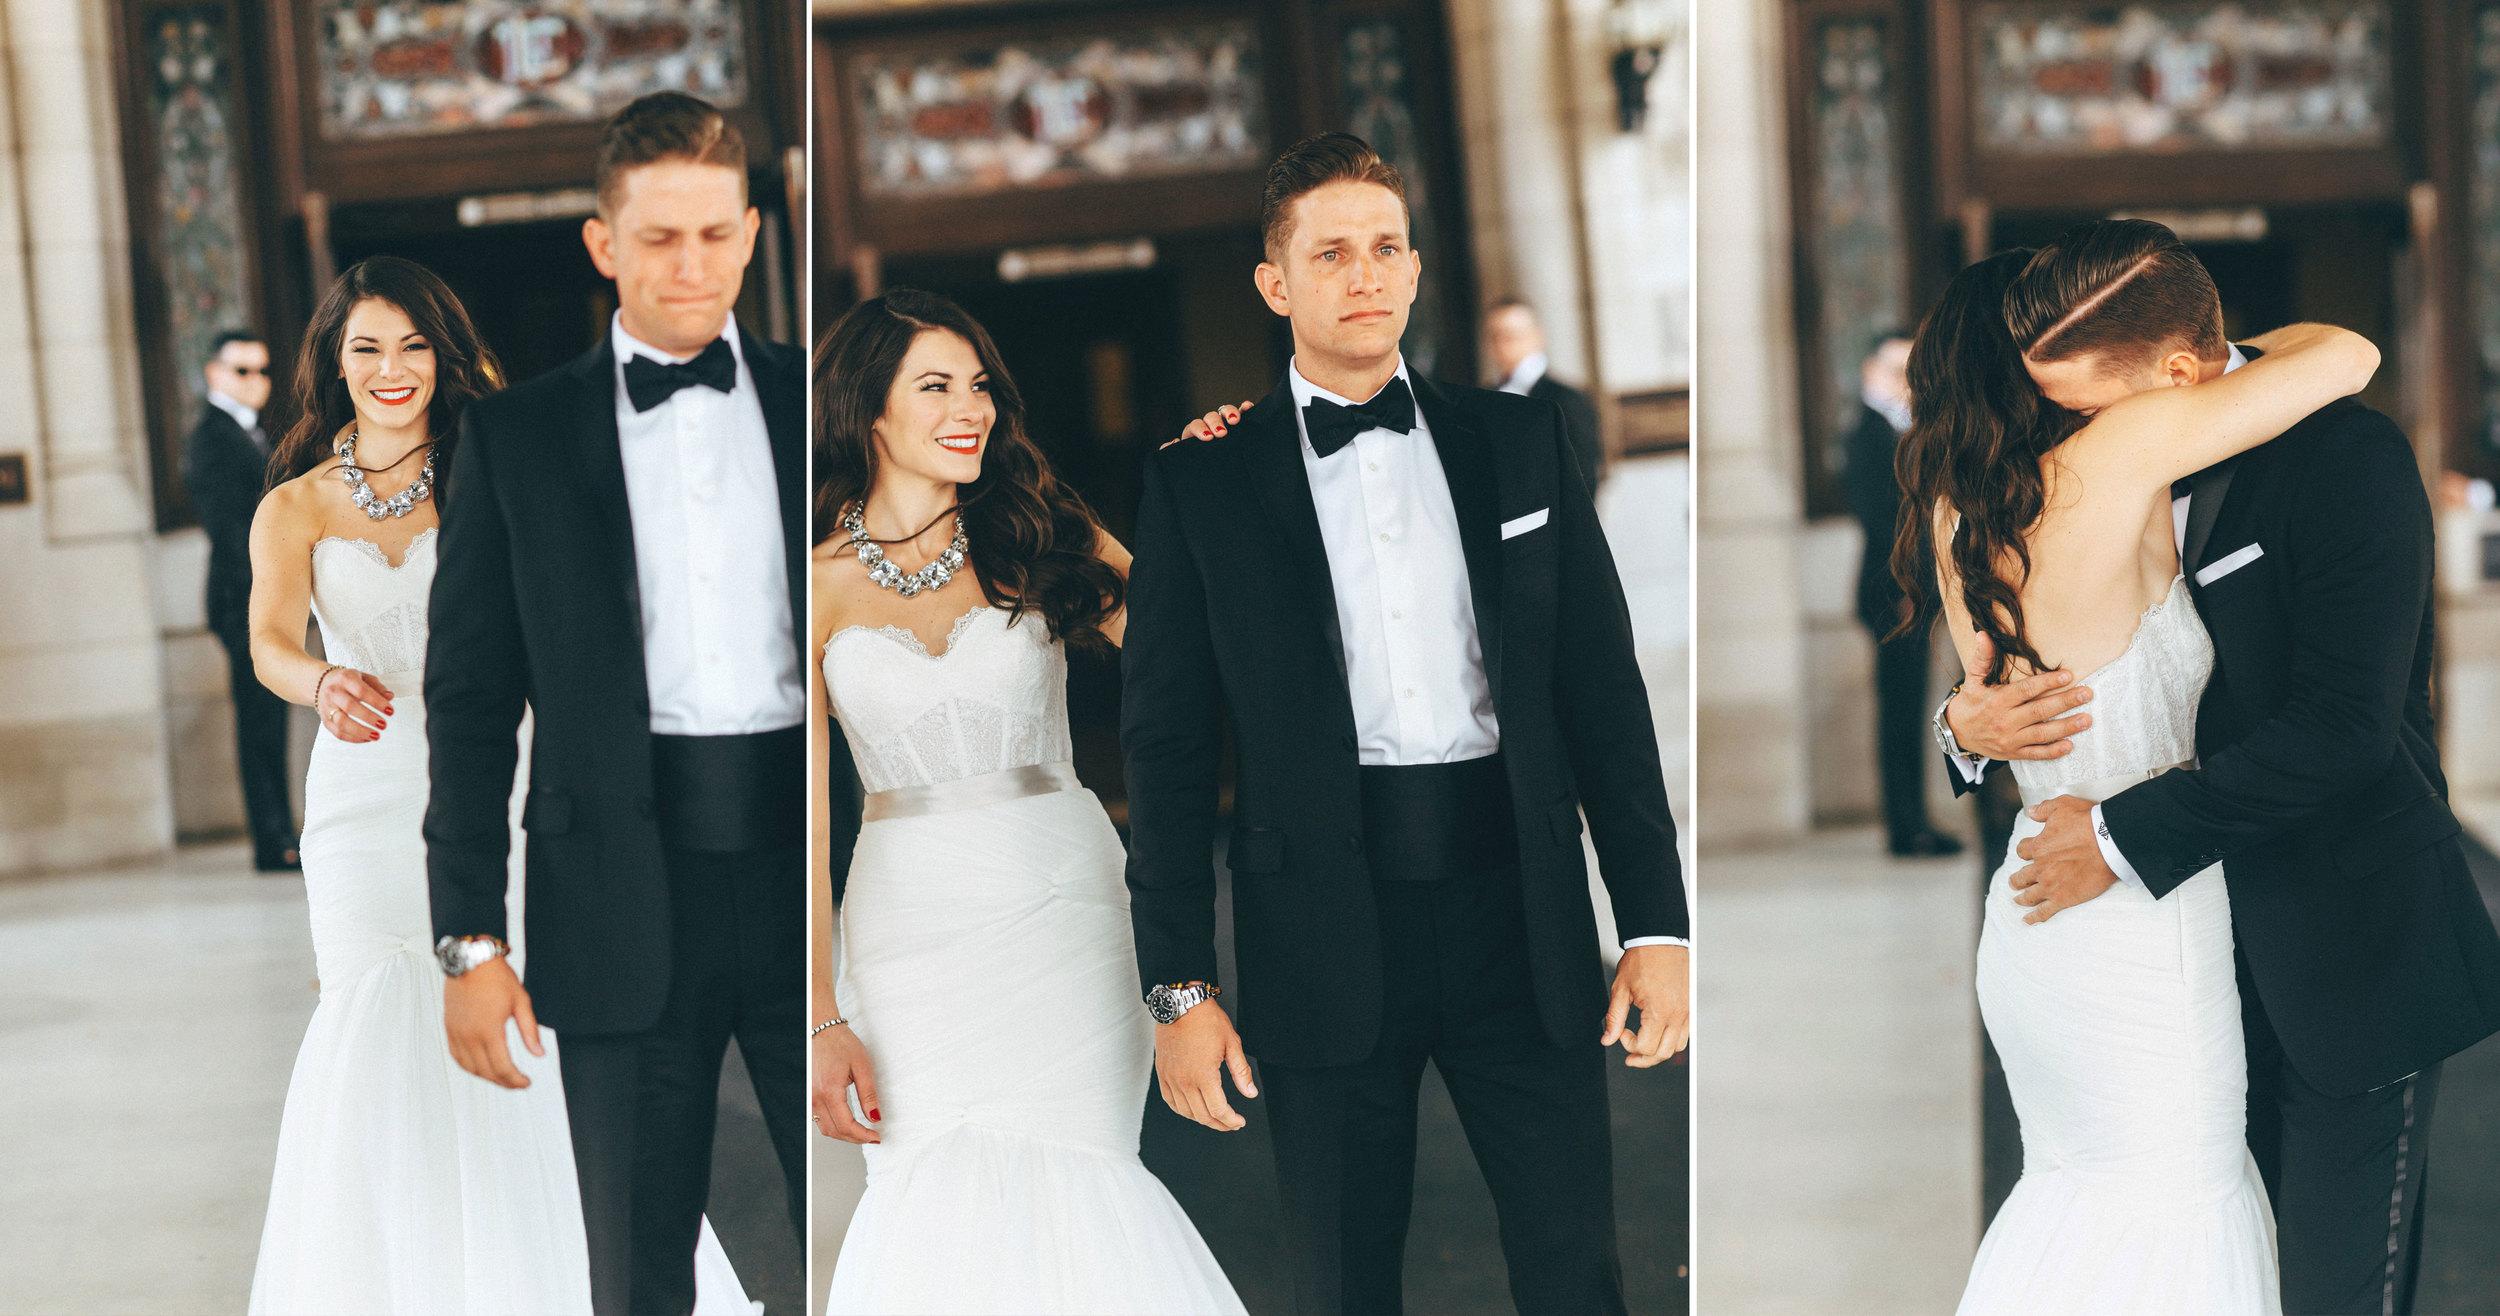 Me & Mr. Jones Wedding, First Look at Union Station Hotel, Nashville Wedding, Black Tie Wedding, Southern Wedding